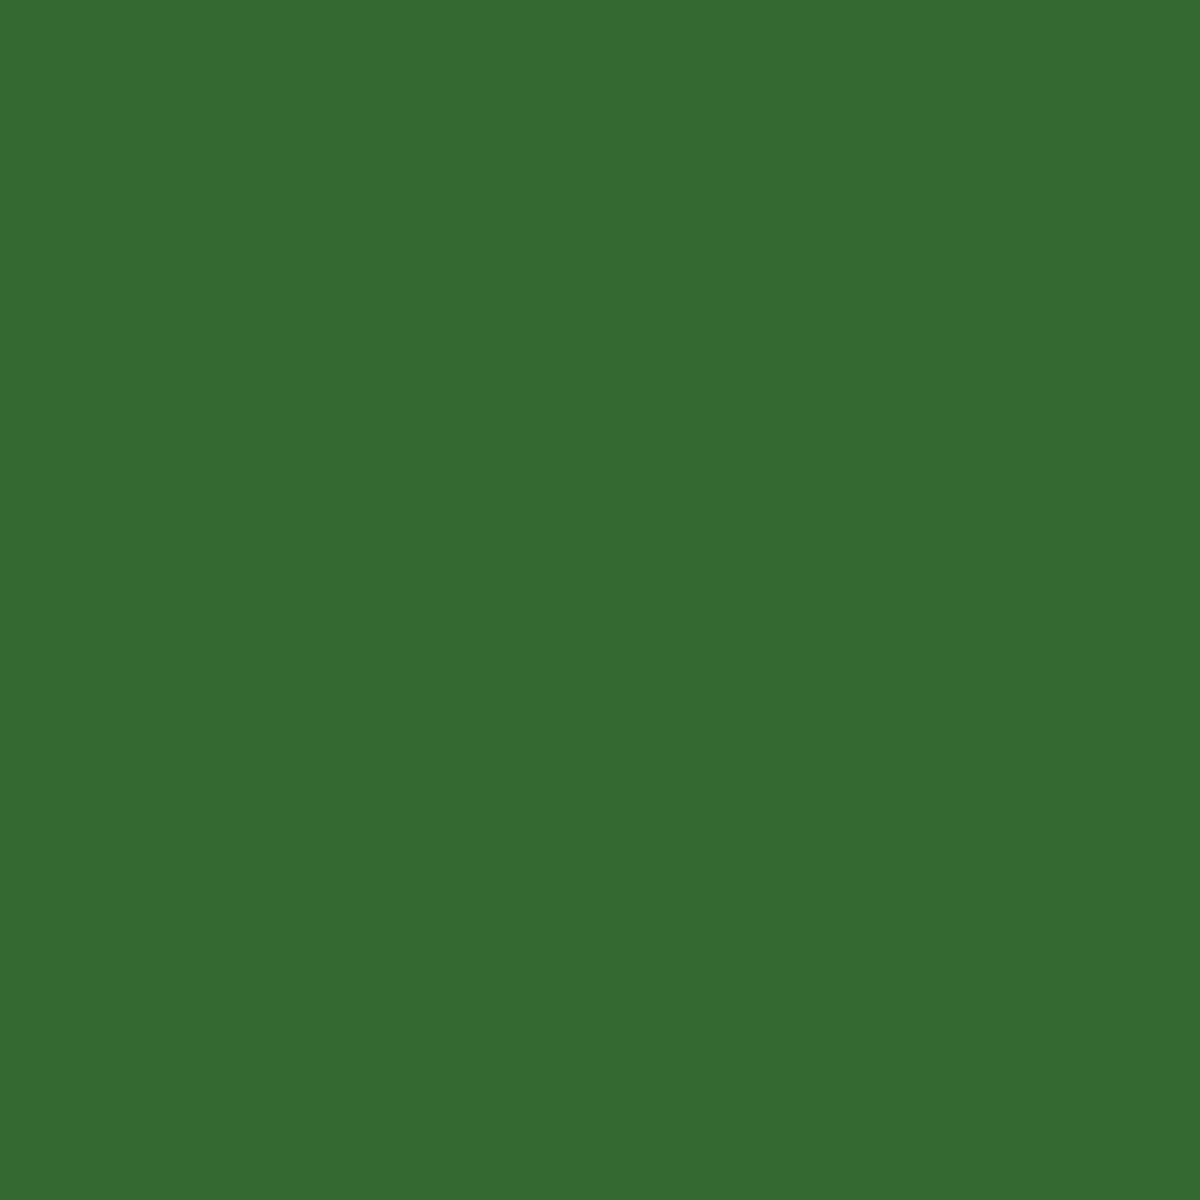 76271 - Mint Green - 5# Bag